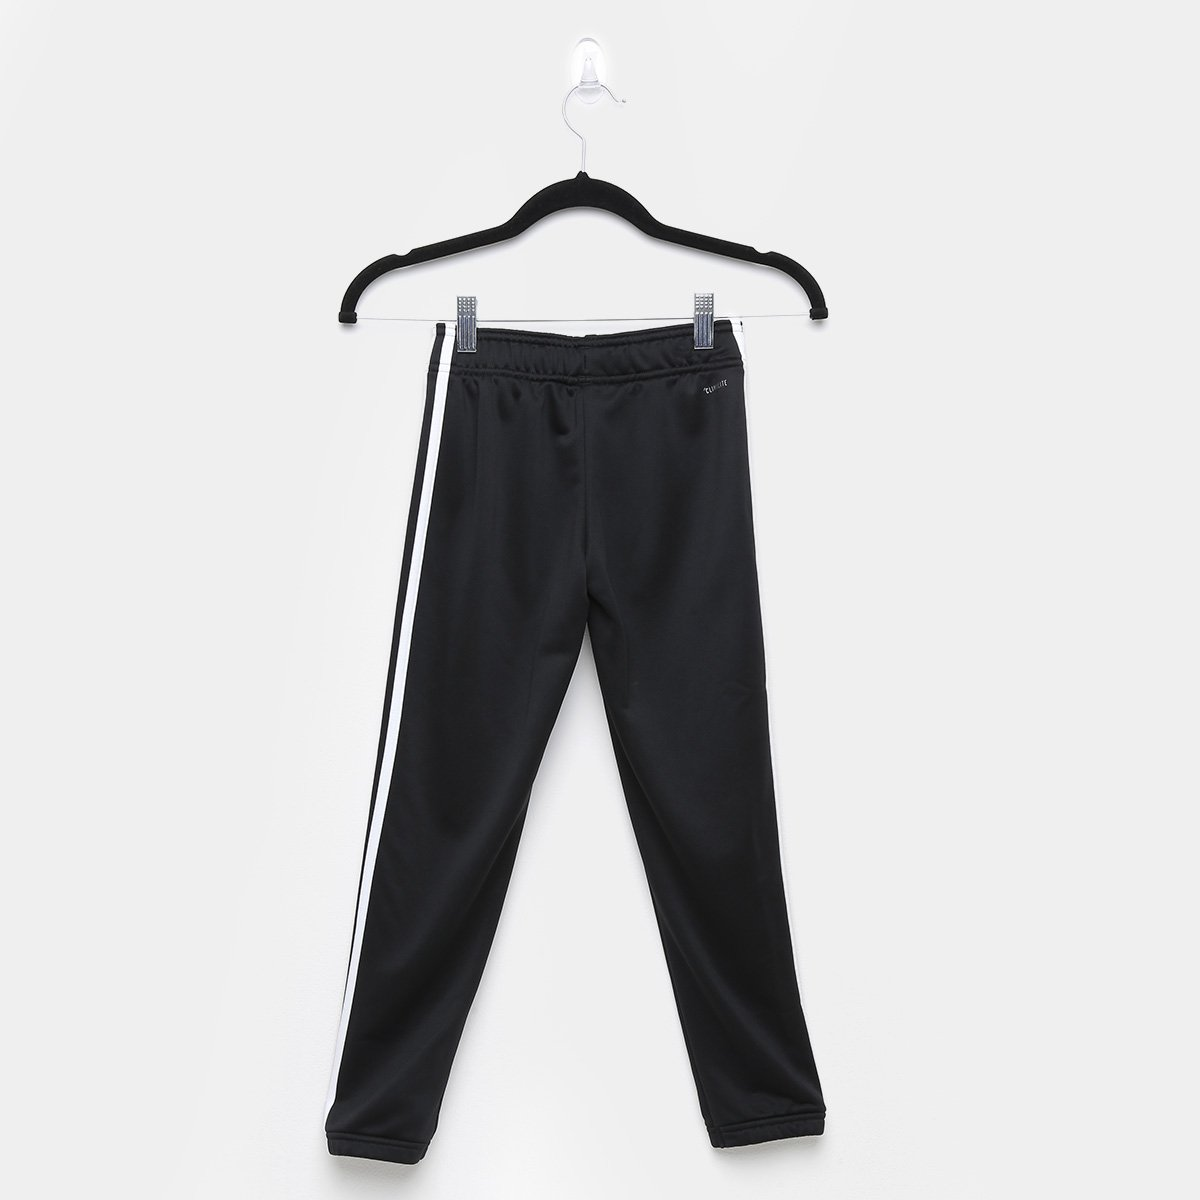 Calça Infantil Adidas Yg C Feminina - Tam: 7-8A - 1